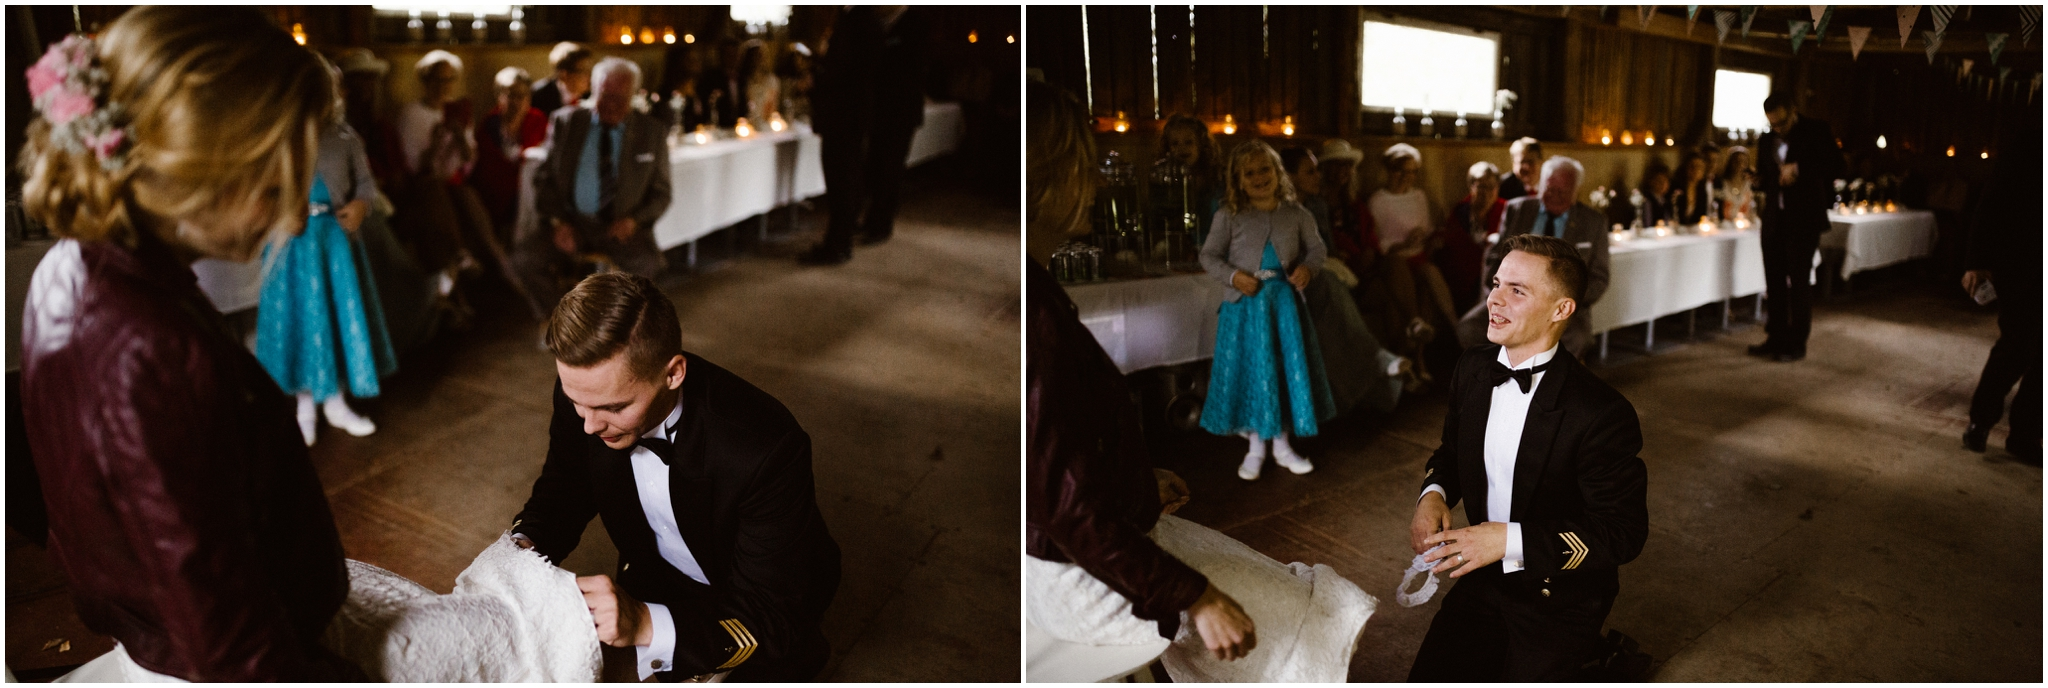 Pinja + Marko -- Patrick Karkkolainen Wedding Photographer-190.jpg